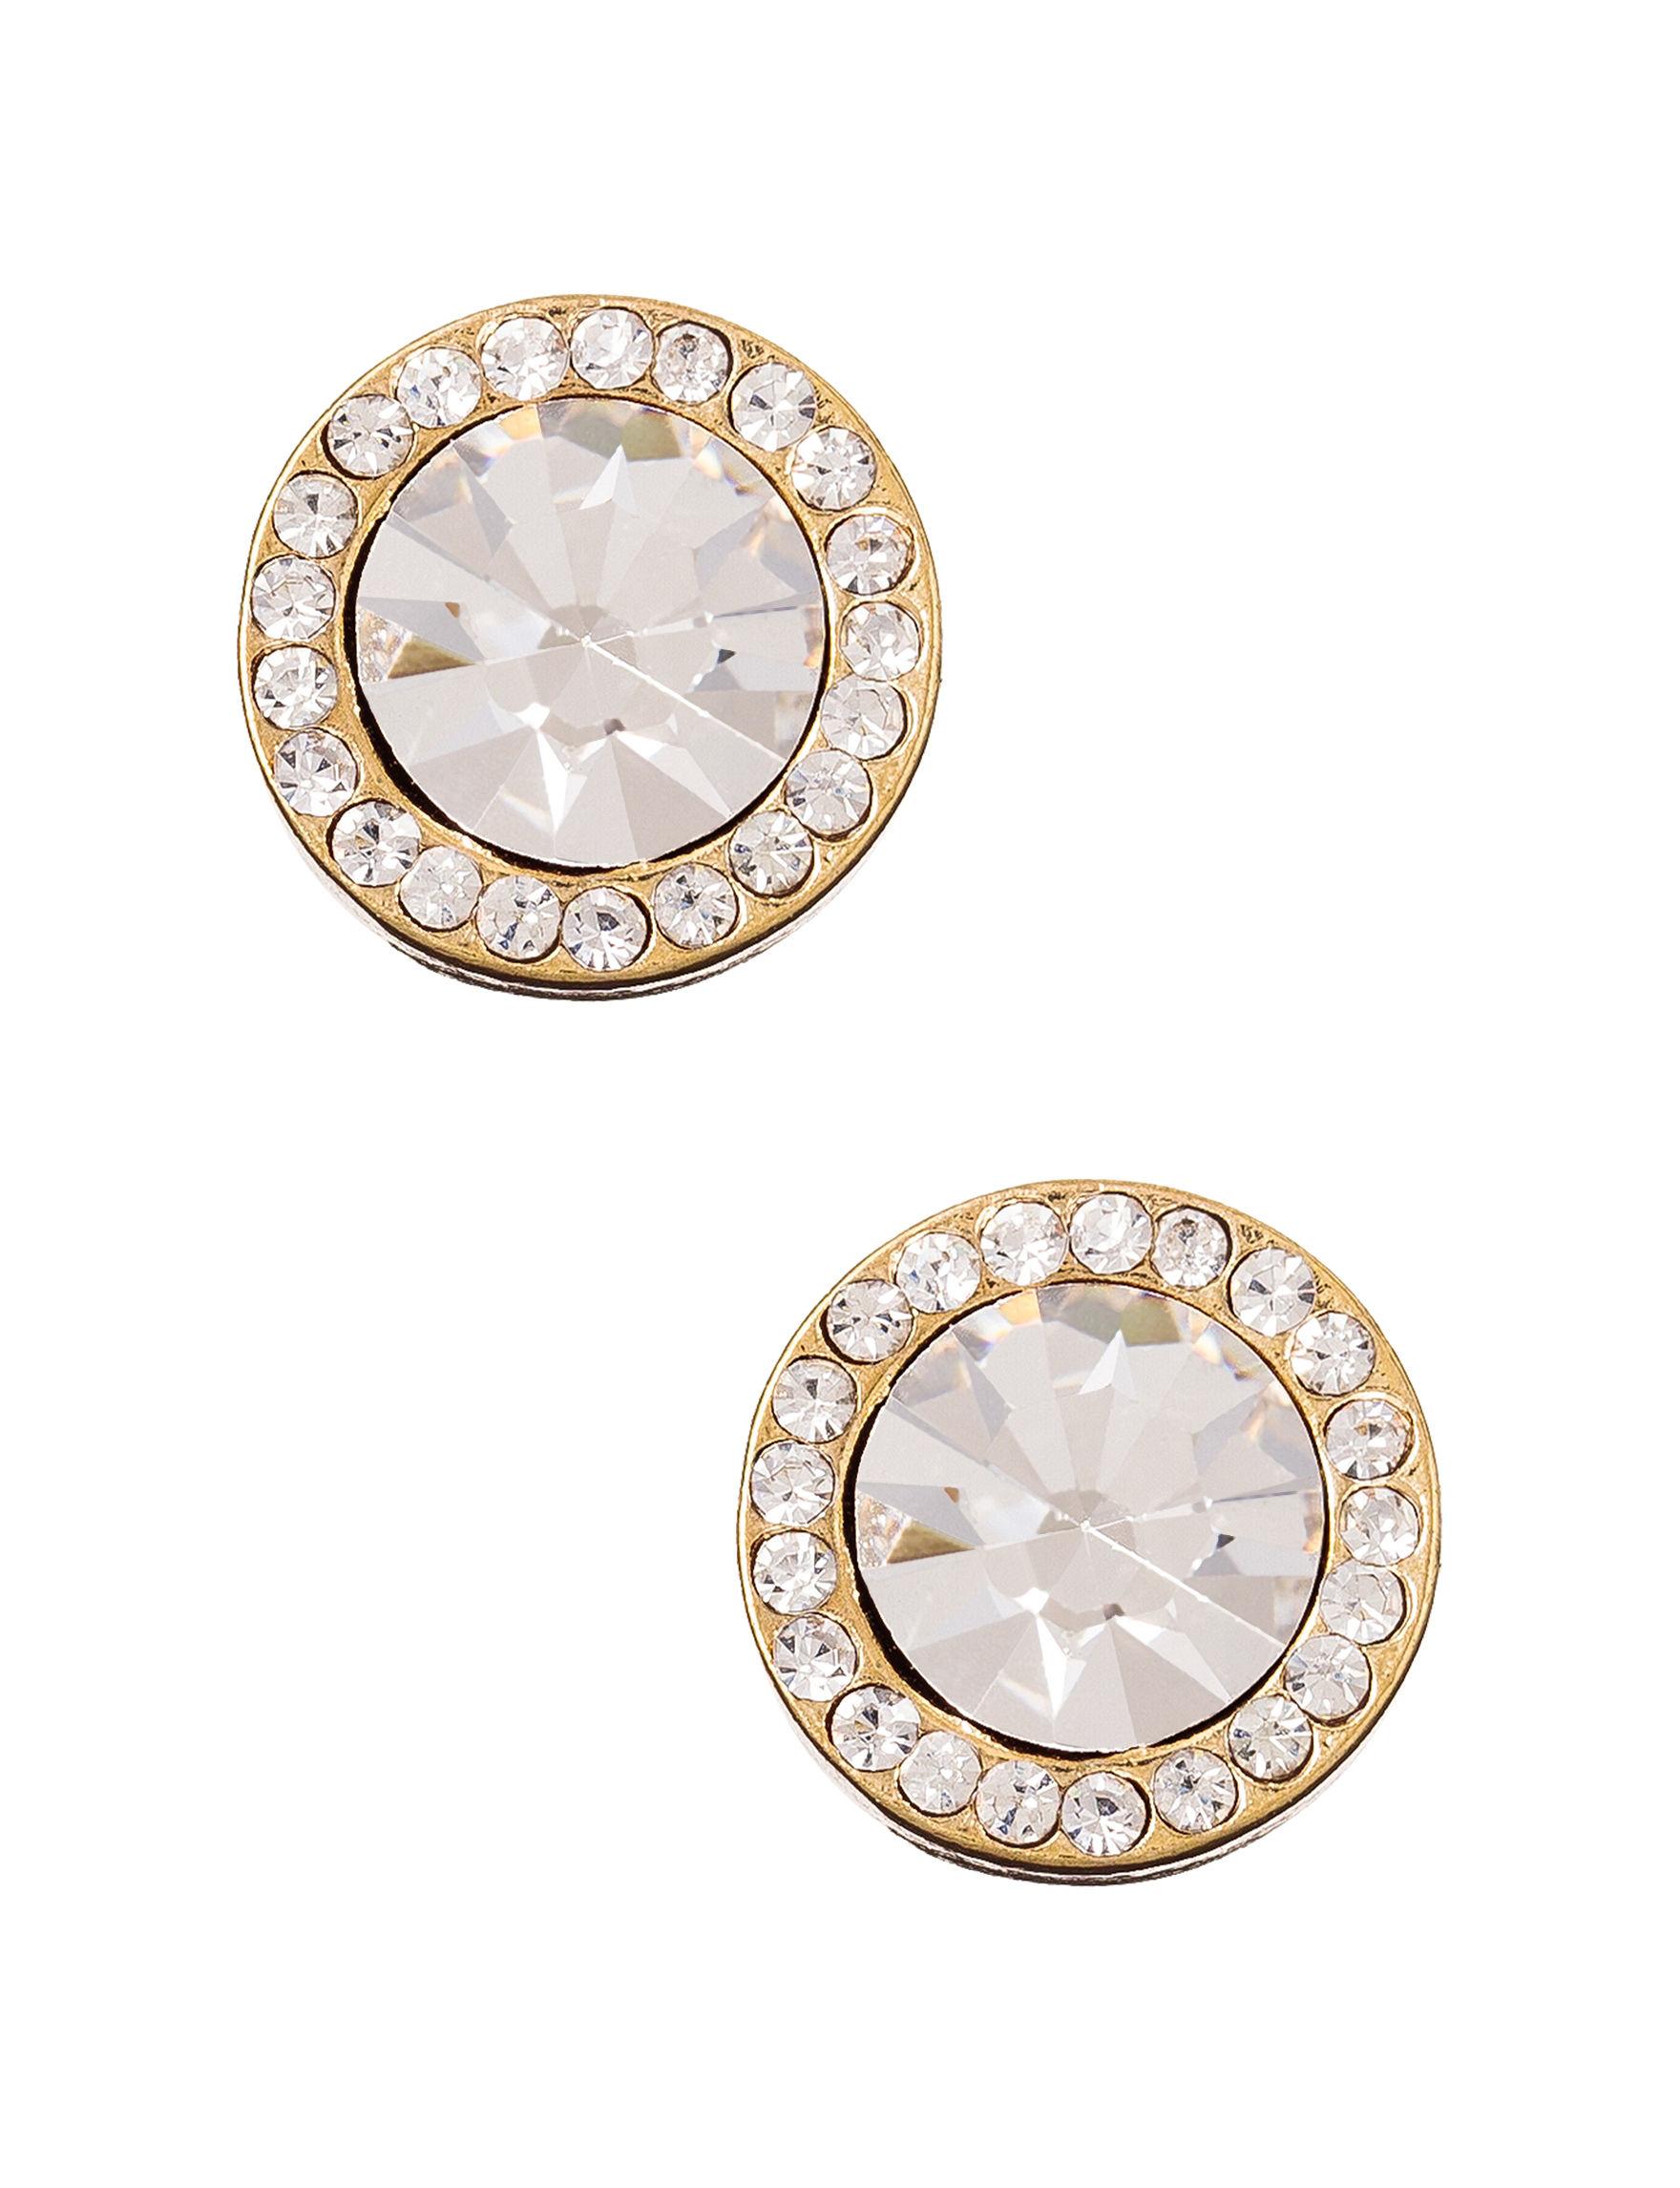 Signature Studio Gold Studs Earrings Fashion Jewelry